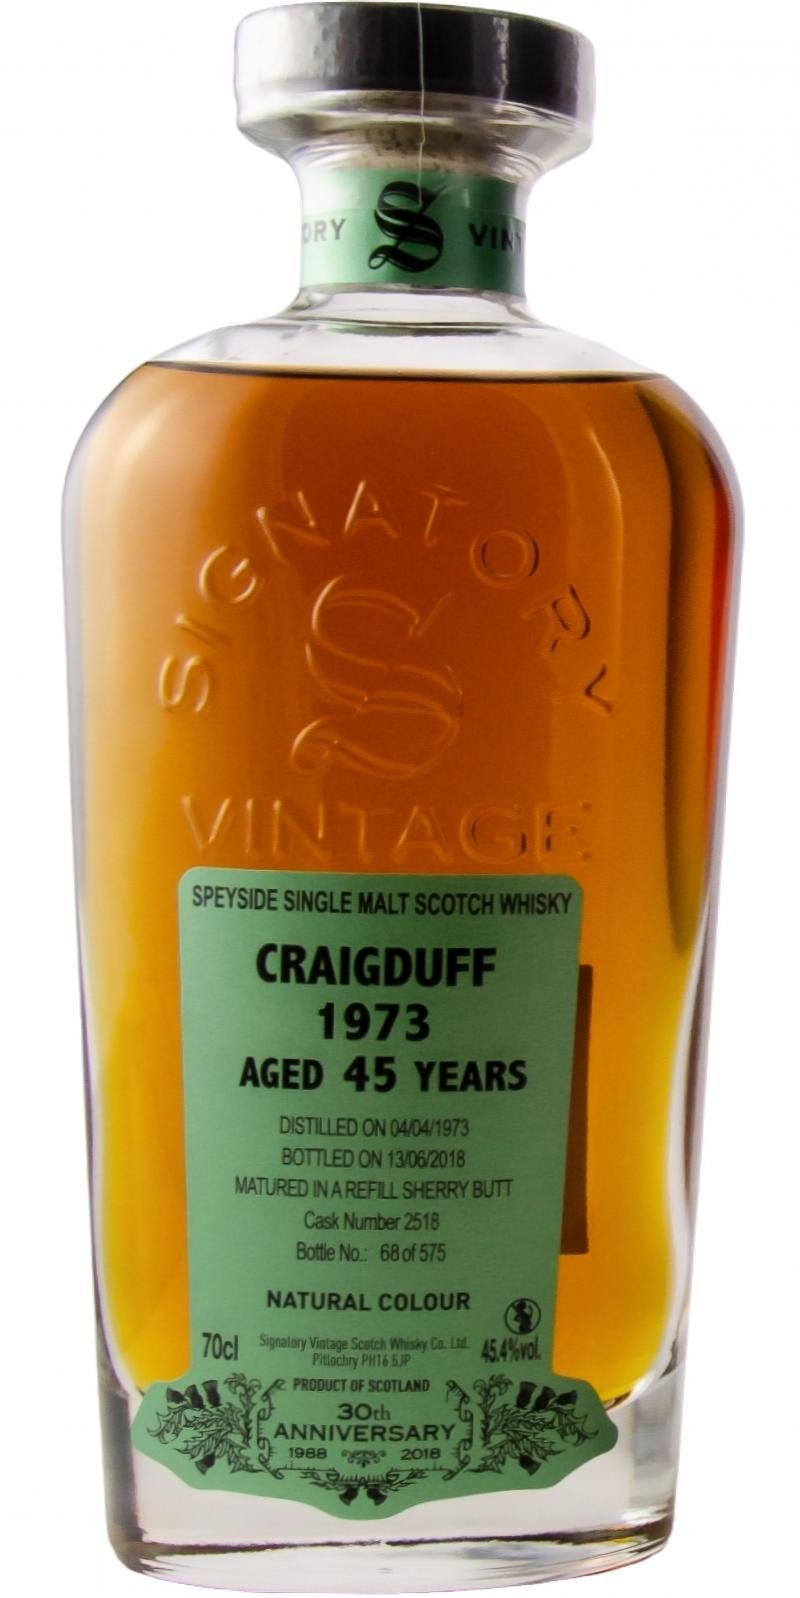 Craigduff 1973 SV